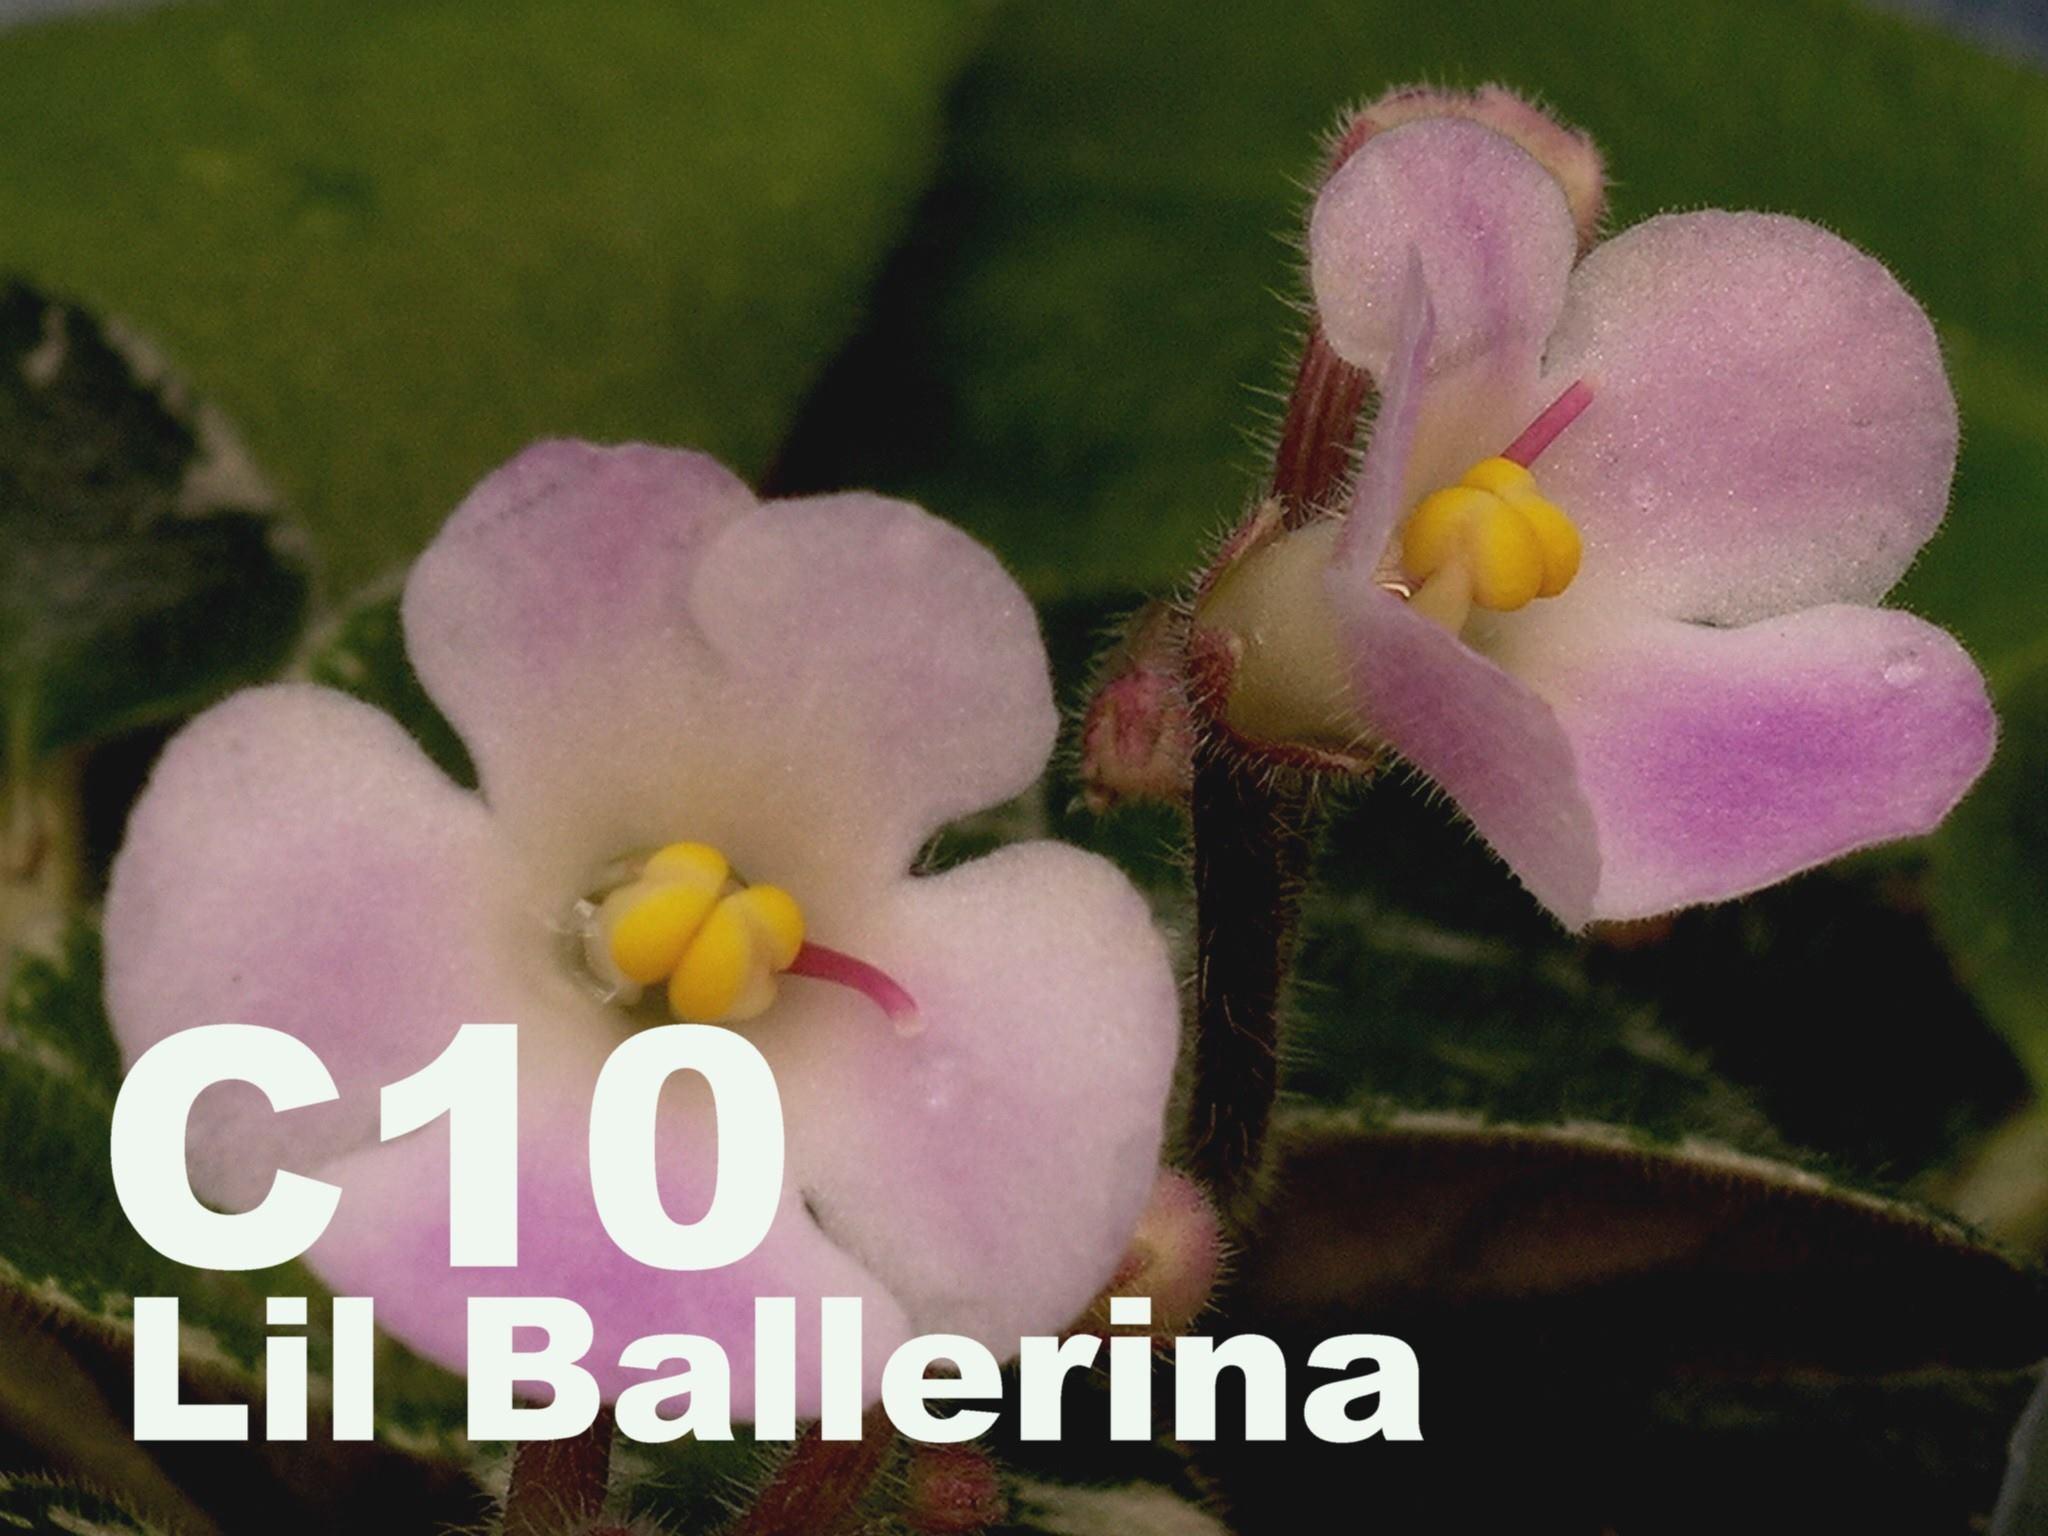 非洲紫羅蘭名錄 | African Violets Catalogue - C系列 C10